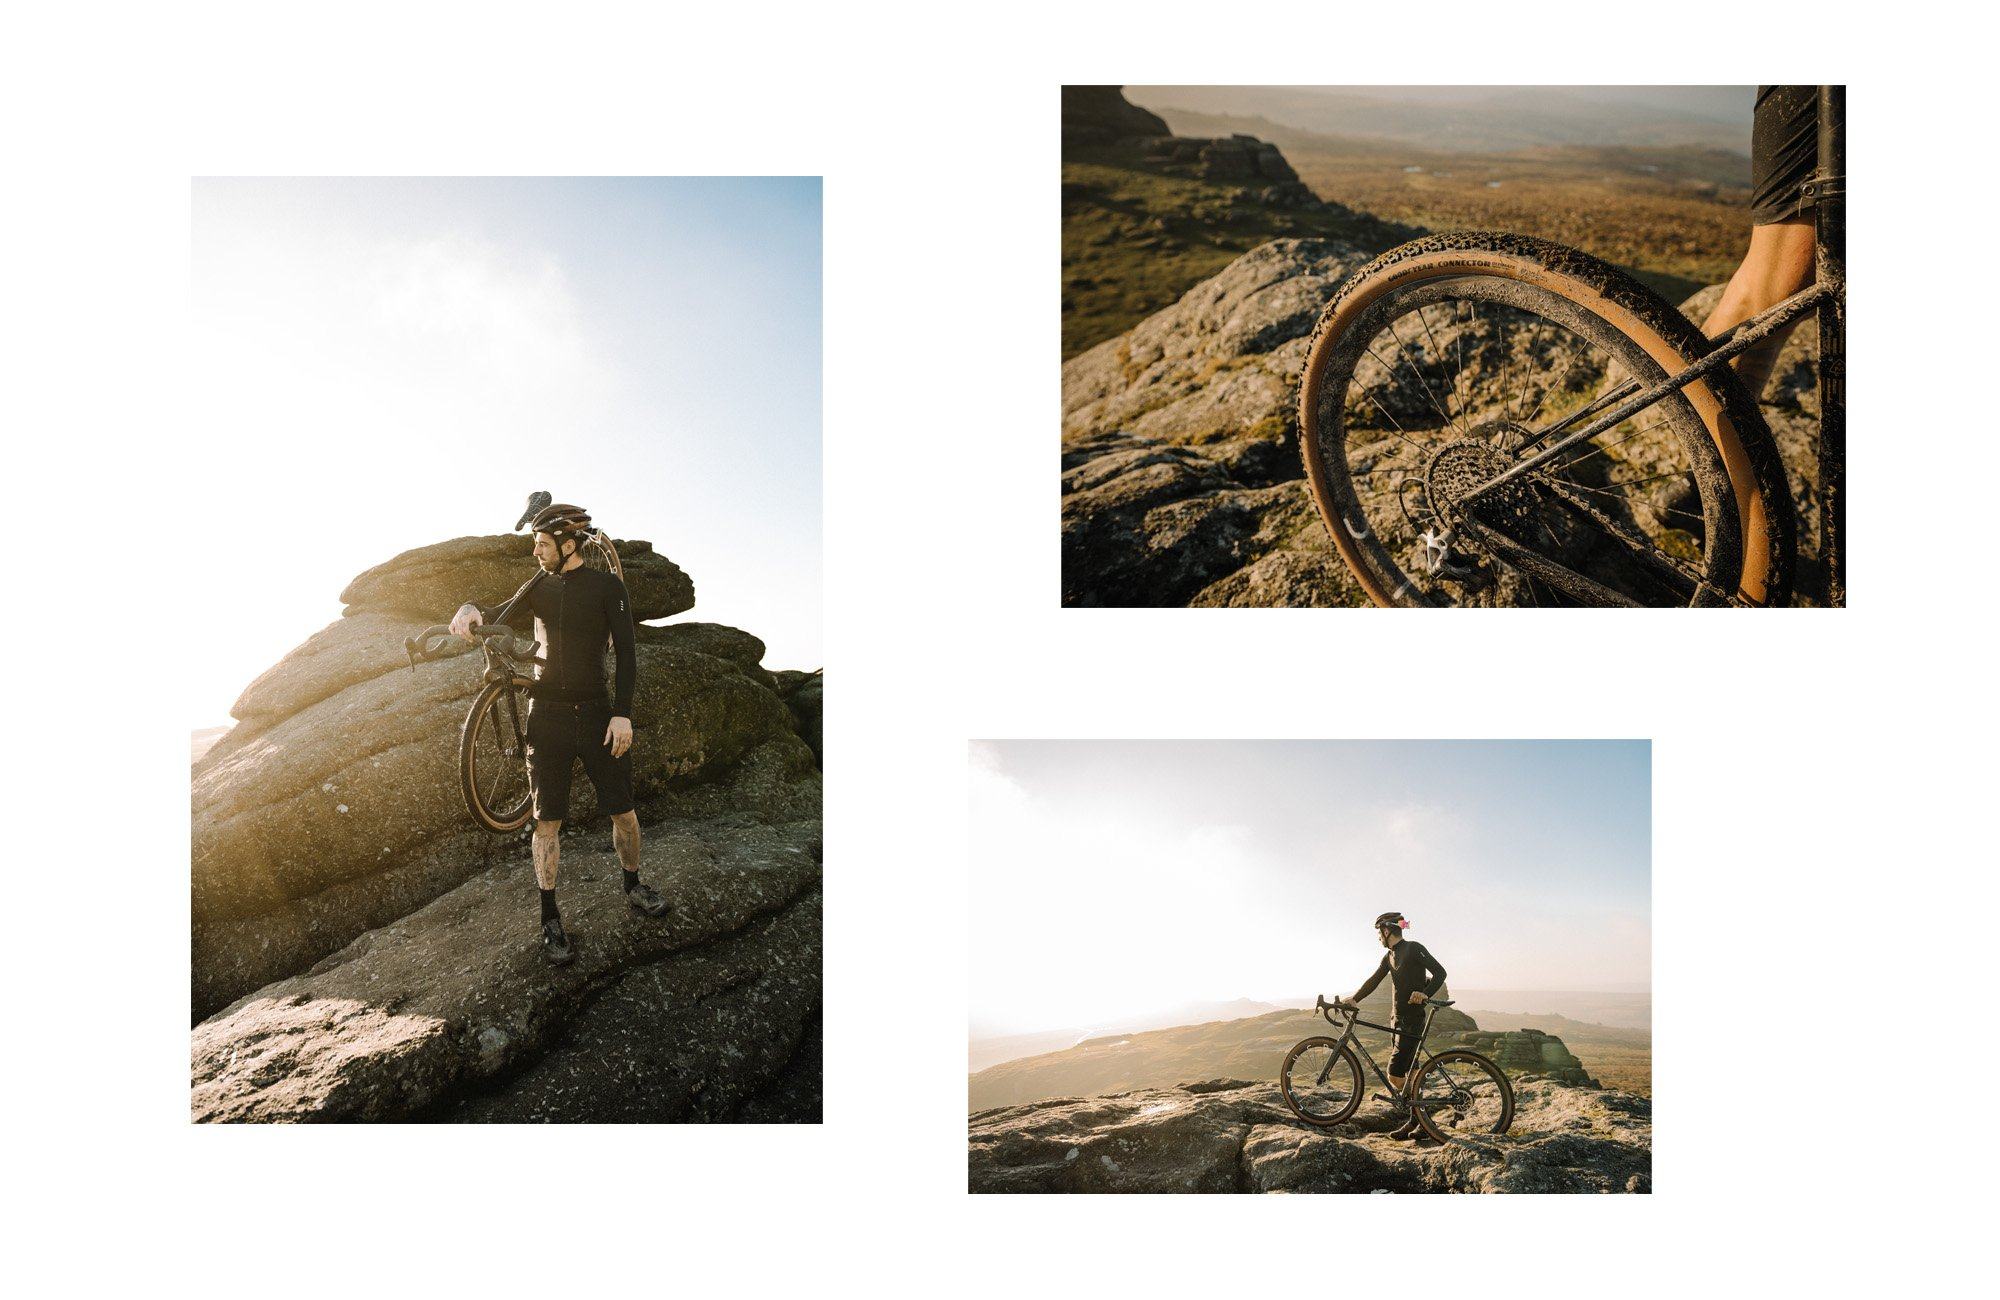 Photo montage of Dave Noakes Wingfoot athlete